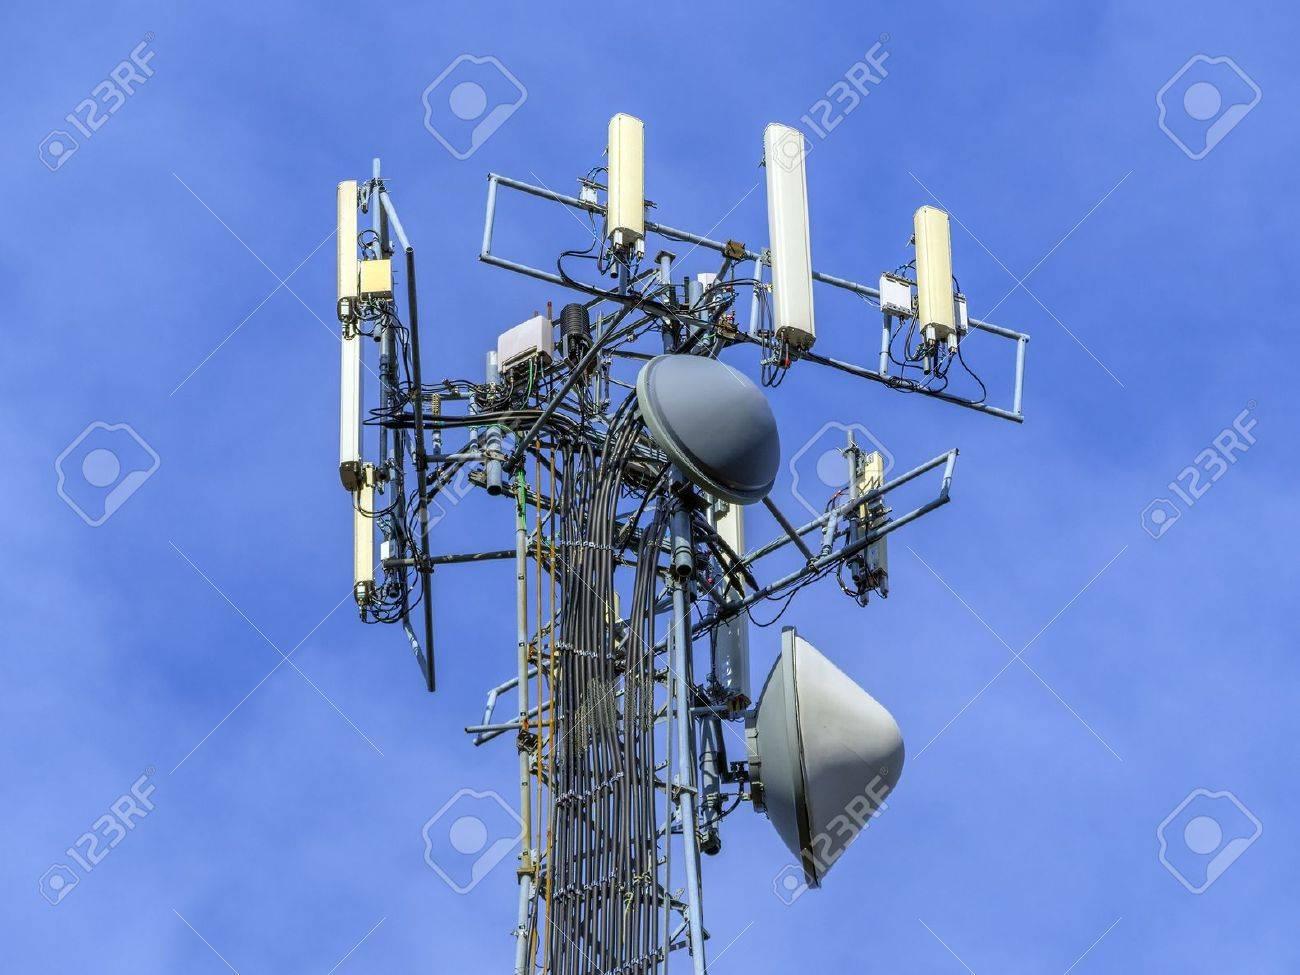 Telecommunications equipment - directional mobile phone antenna dishes. Wireless communication. Stock Photo - 17018804